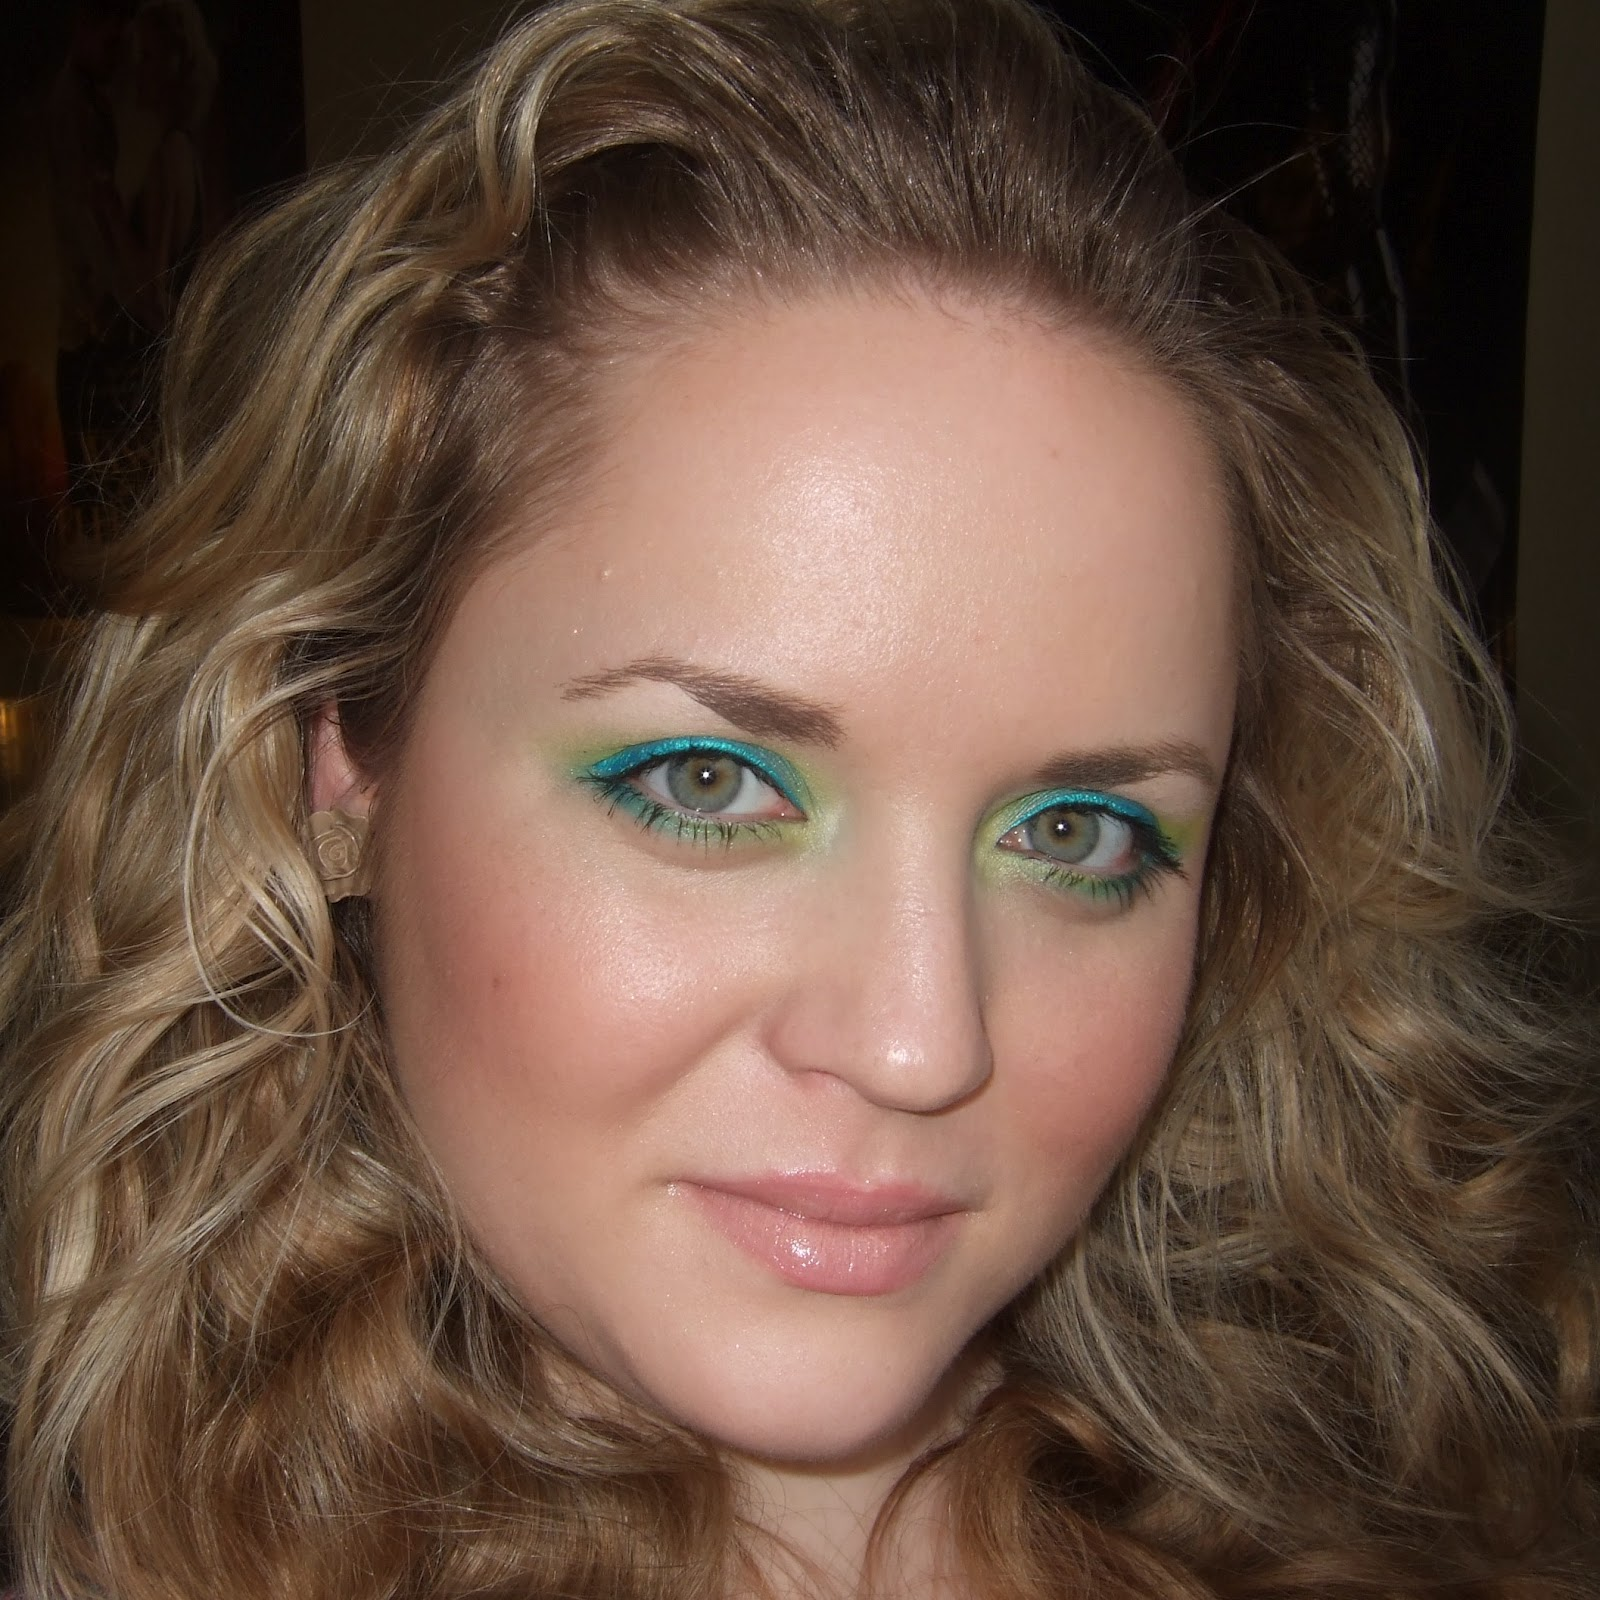 Daily Make Up Blau Gelbes Ombre Augen Make Up